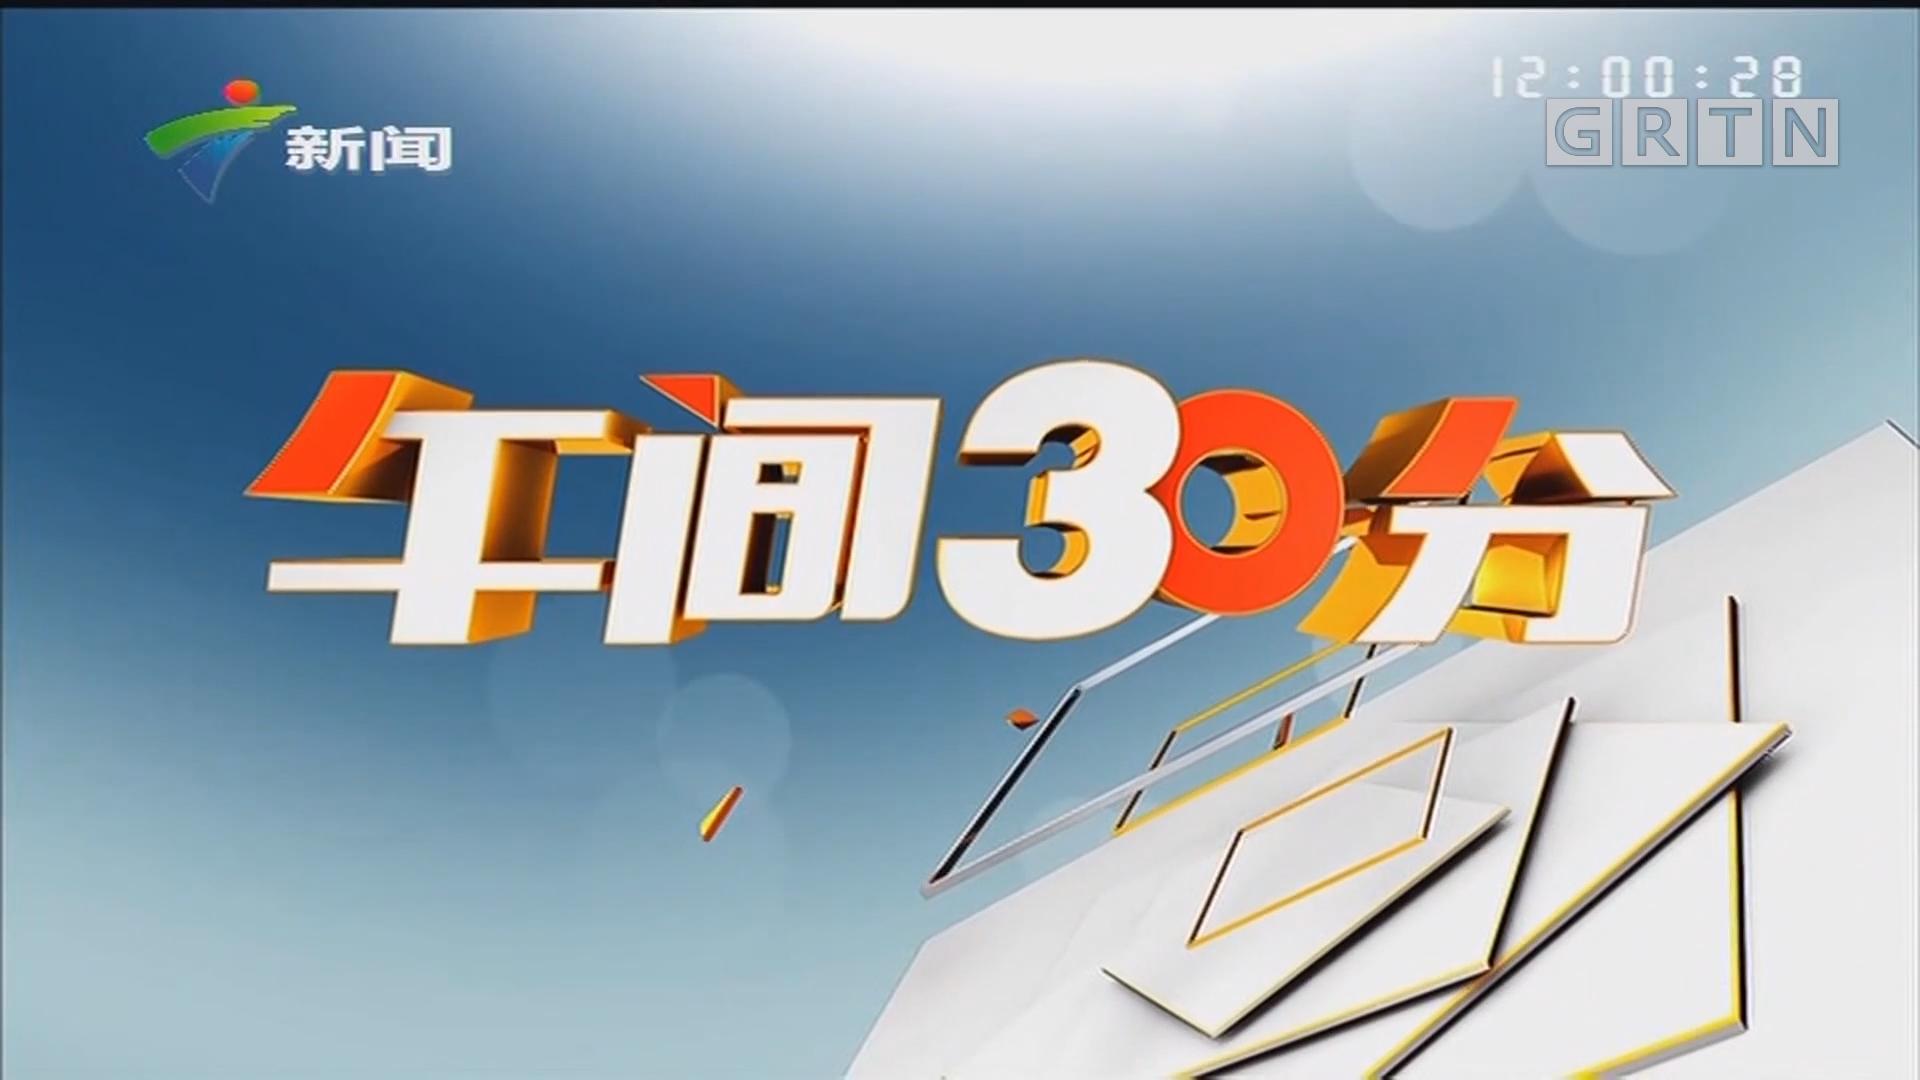 [HD][2019-11-05]午间30分:第二届中国国际进口博览会开幕:展现中国市场魅力 世界500强企业热情高